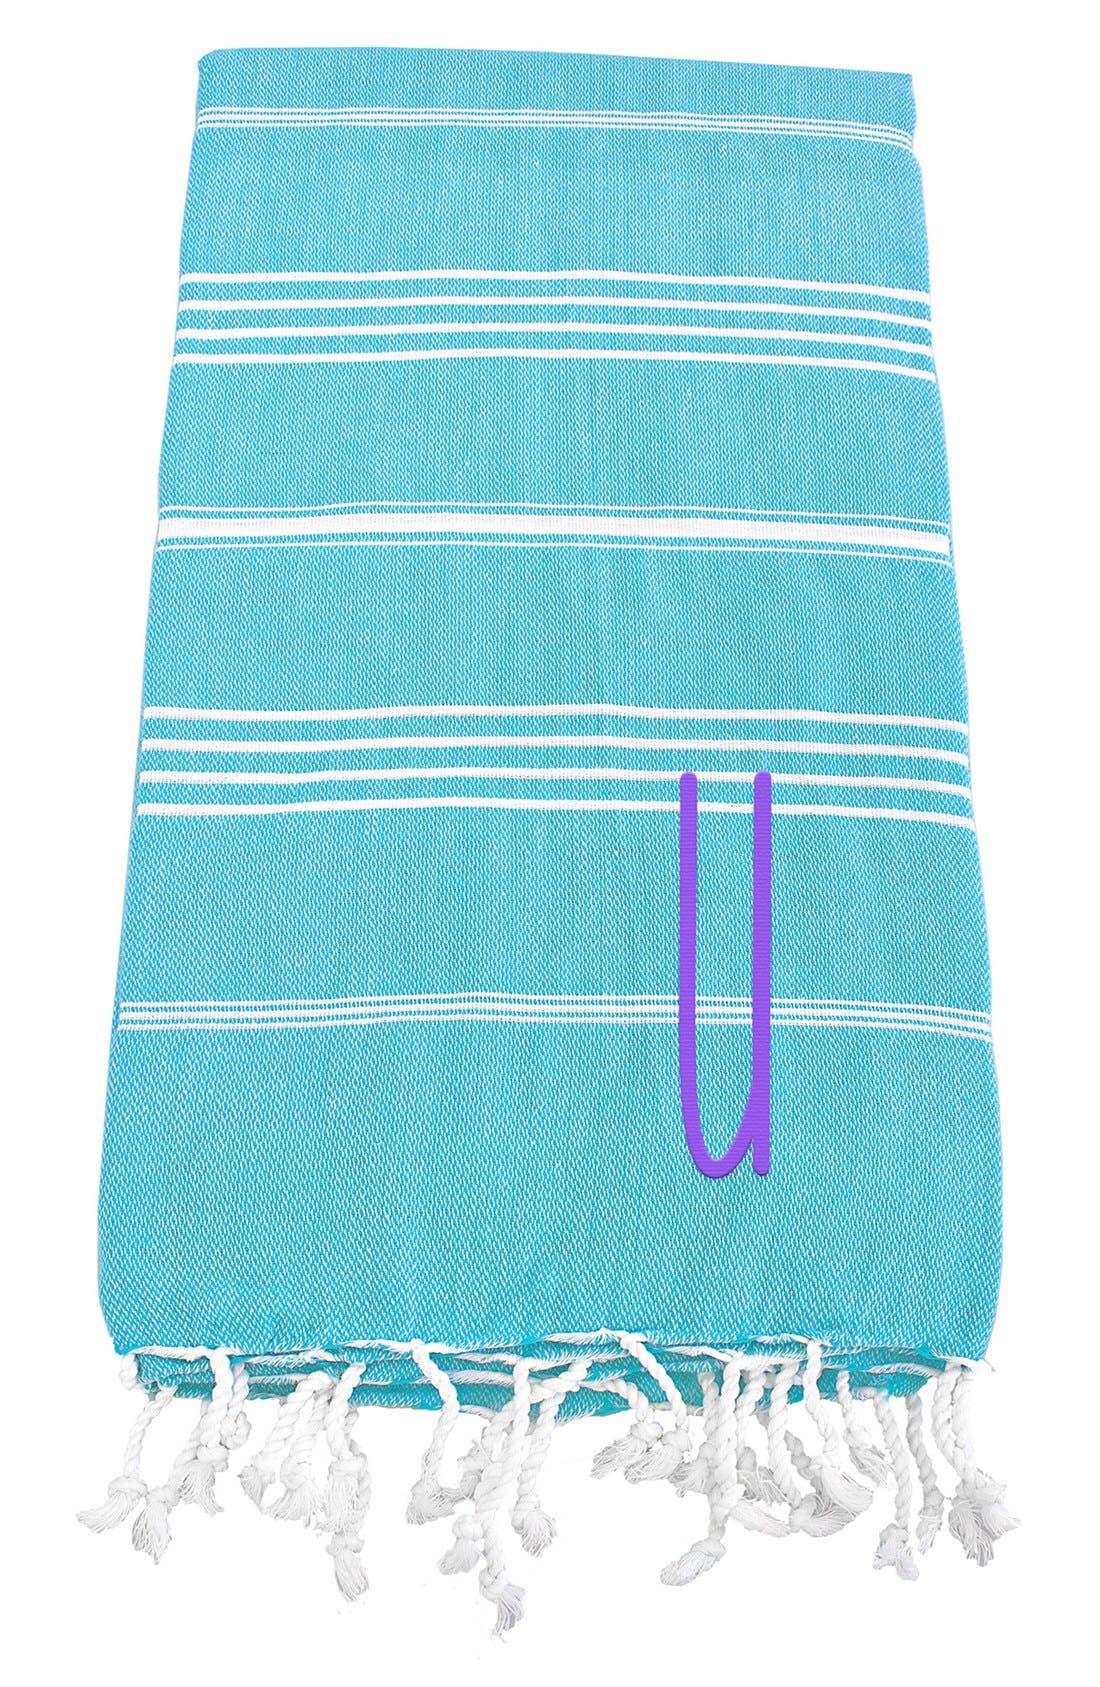 Monogram Turkish Cotton Towel,                             Main thumbnail 1, color,                             Turquoise - U